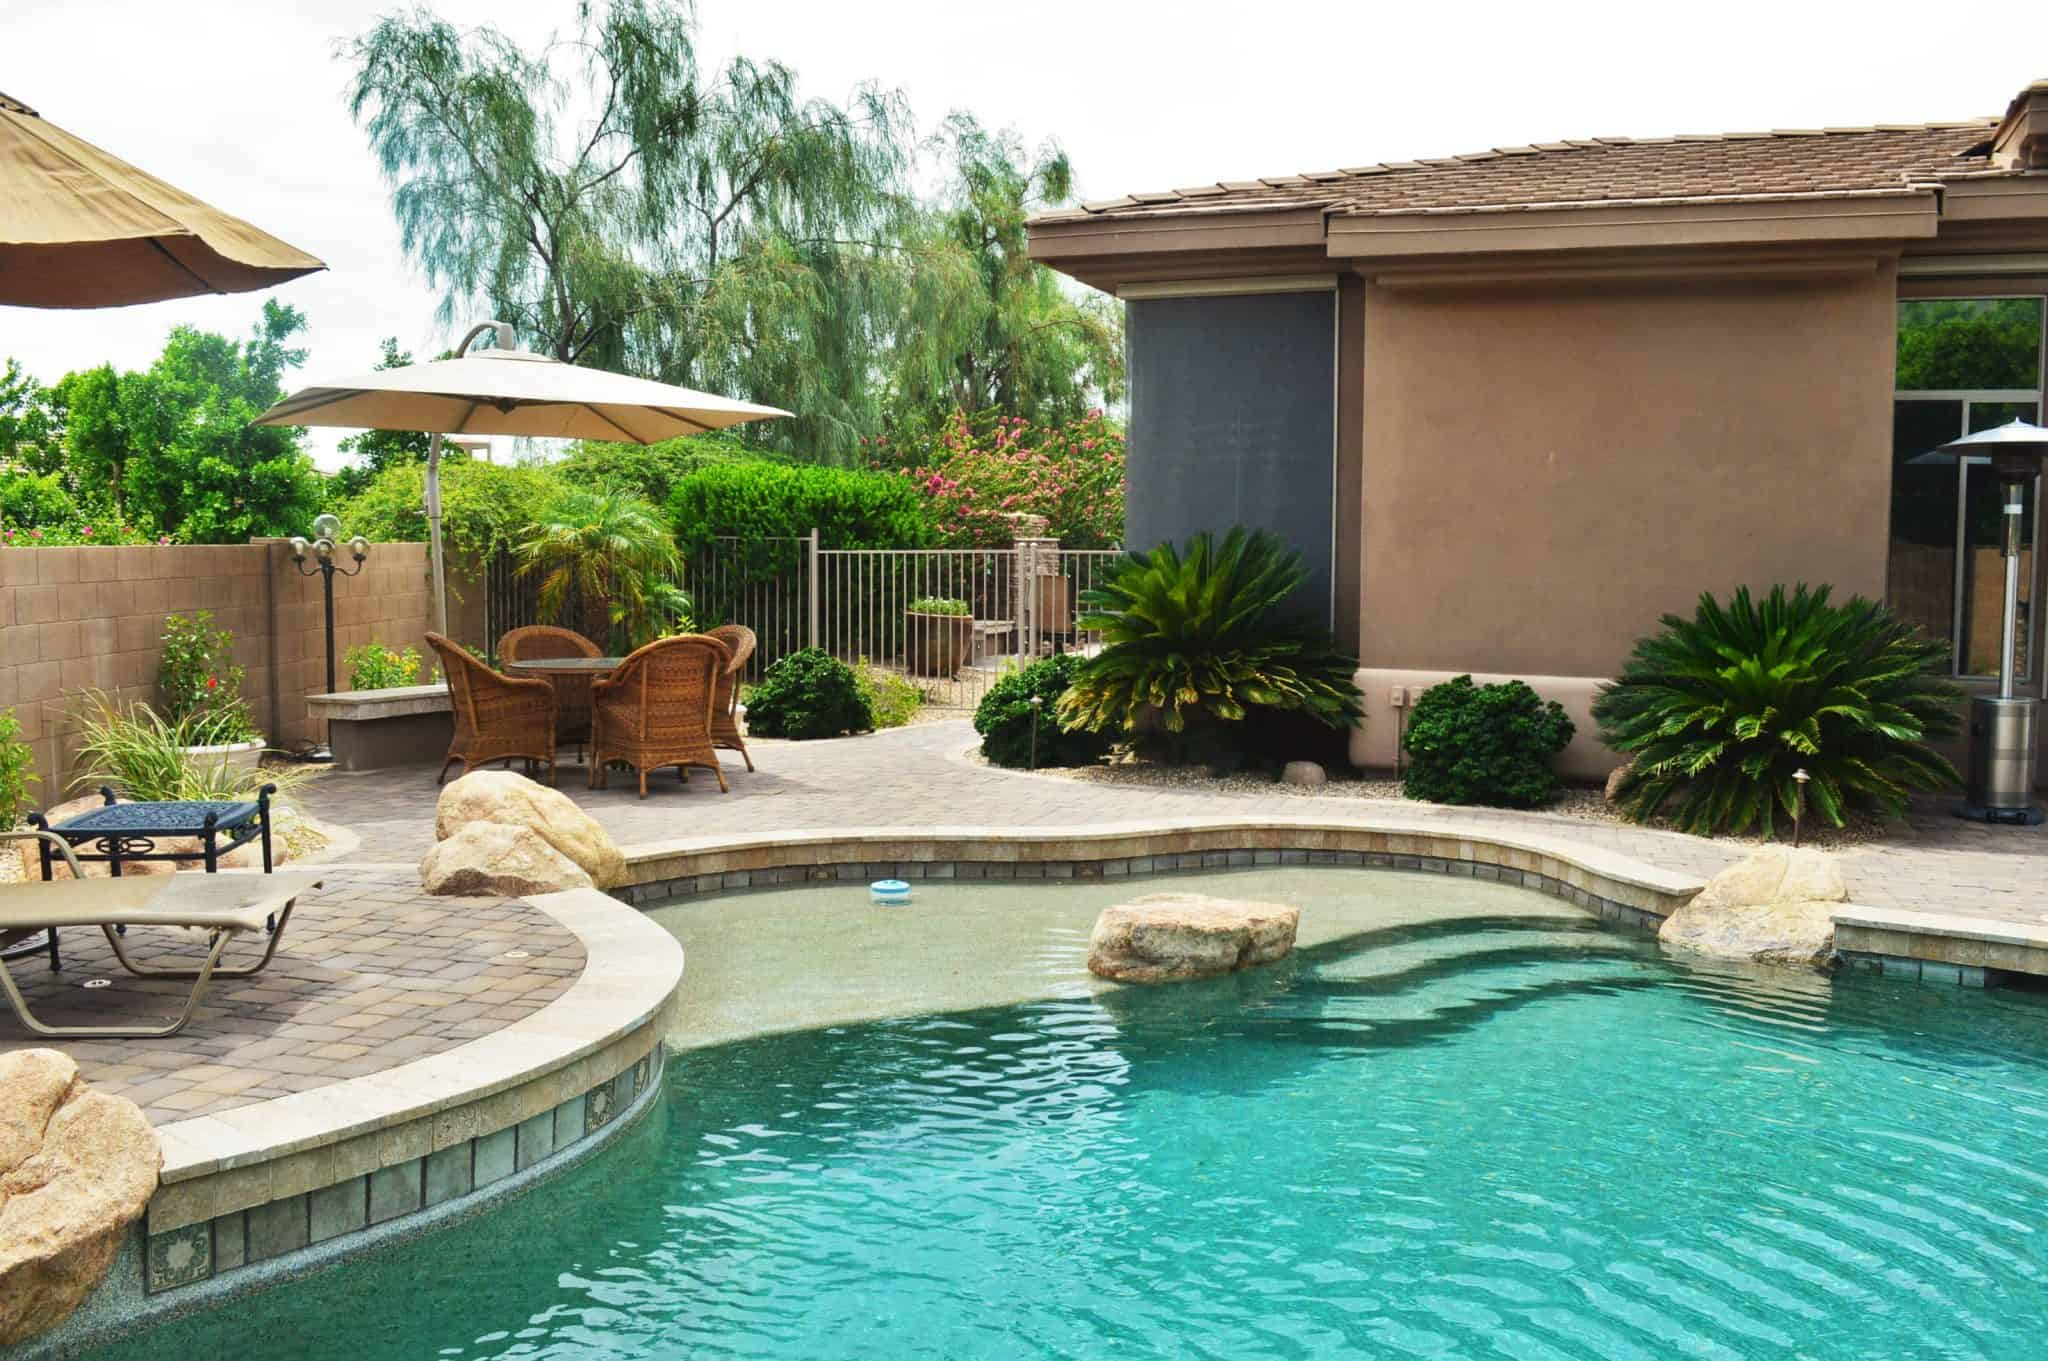 Imagine Backyard Living Hot Tub Spa Jacuzzi Sundance (1)